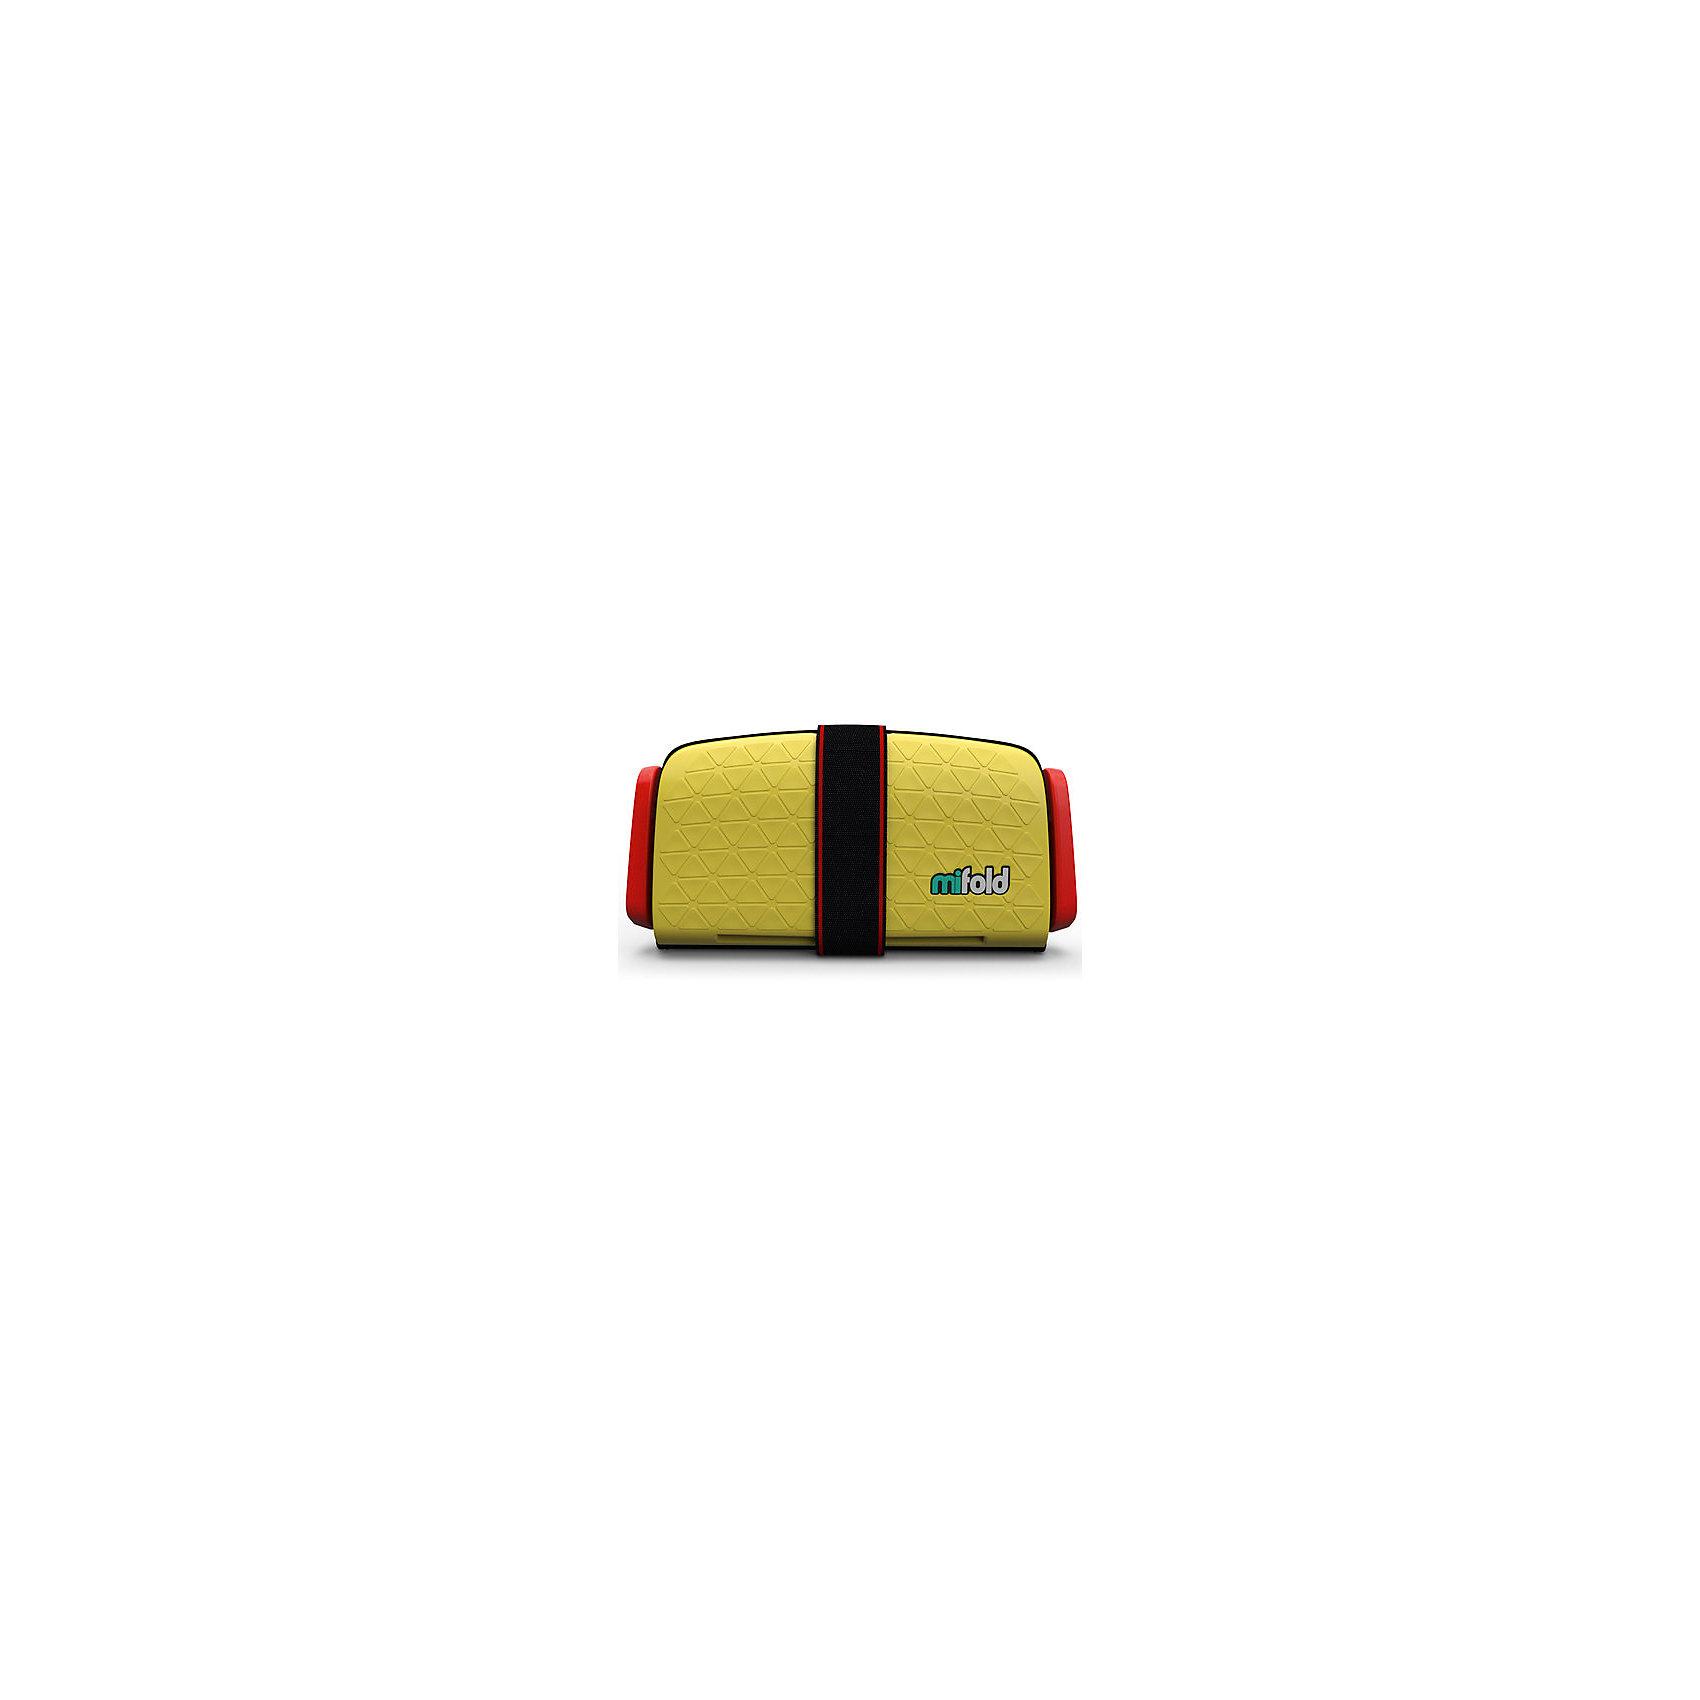 Автокресло-бустер Mifold 15-36 кг, taxi yellowБустеры<br>Бустер автомобильный Mifold - the Grab-and-Go Booster seat/Taxi Yellow<br><br>Ширина мм: 170<br>Глубина мм: 255<br>Высота мм: 75<br>Вес г: 950<br>Возраст от месяцев: 48<br>Возраст до месяцев: 144<br>Пол: Унисекс<br>Возраст: Детский<br>SKU: 6878757